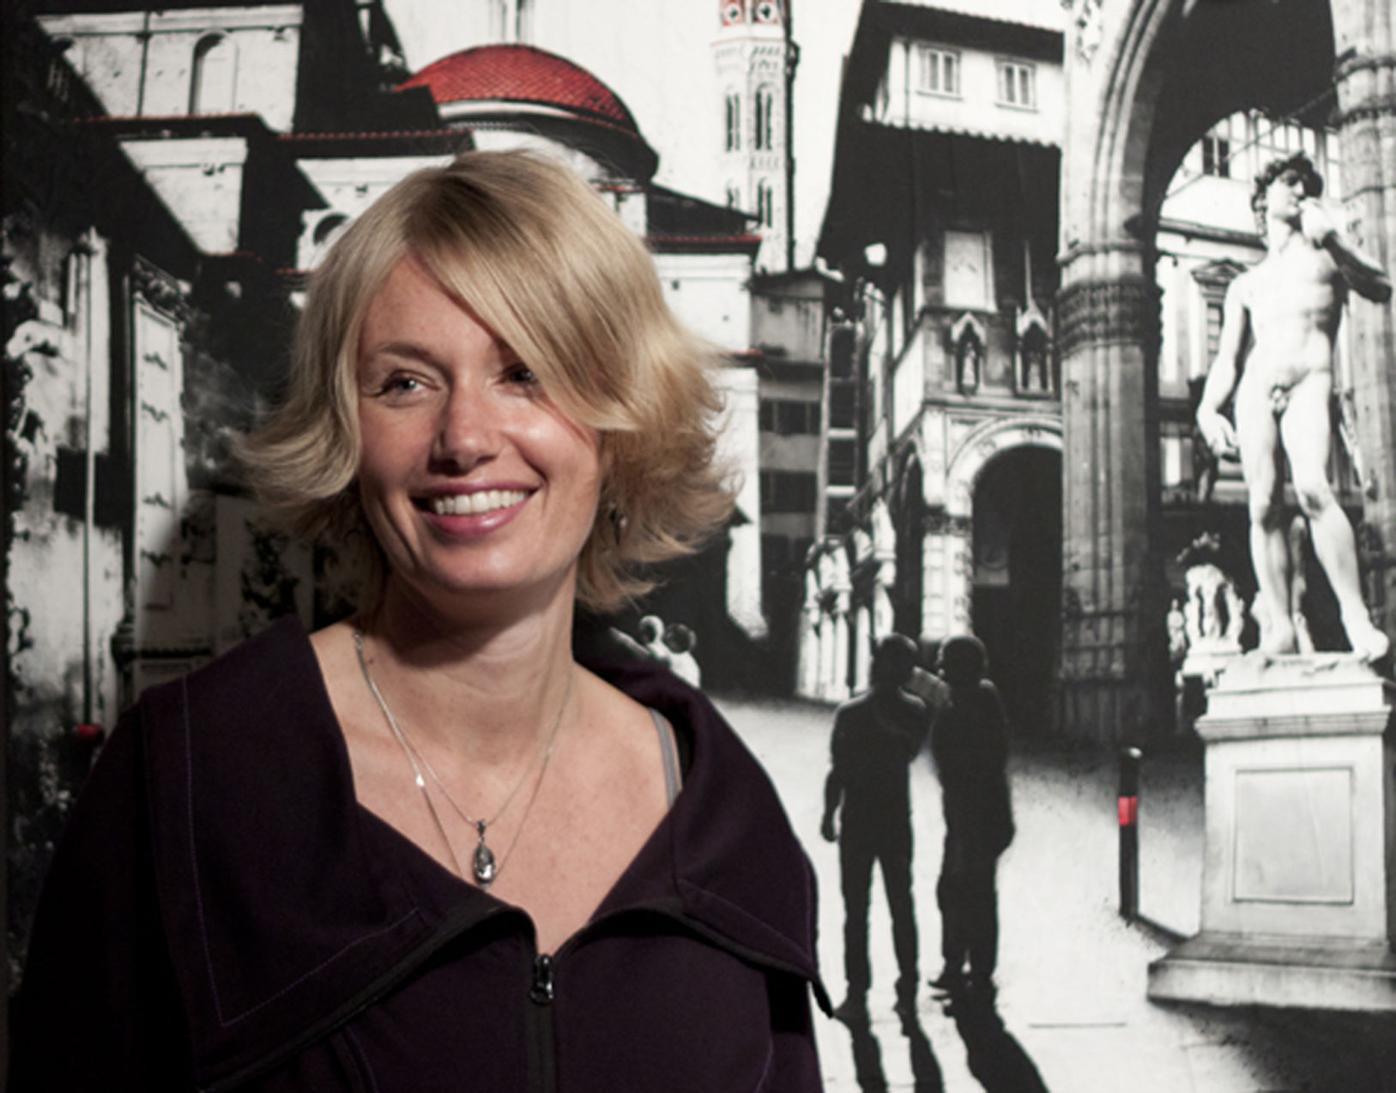 Visual artist Denise Buisman Pilger exhibits